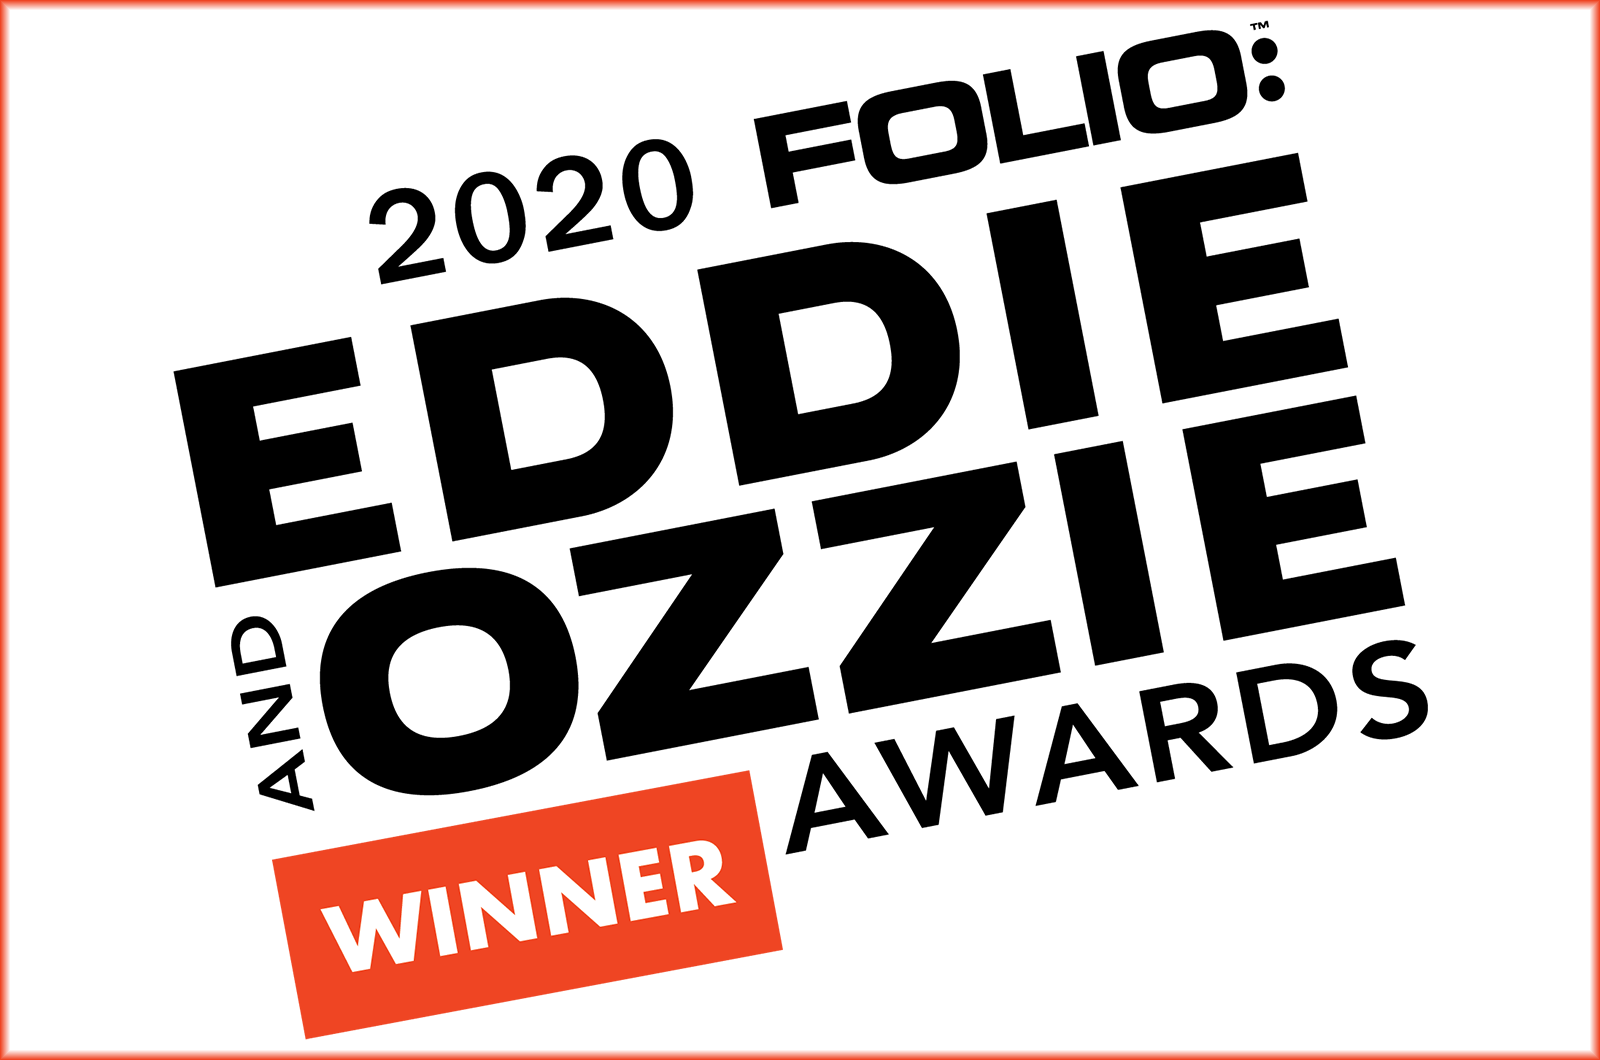 2020 Folio award winner logo